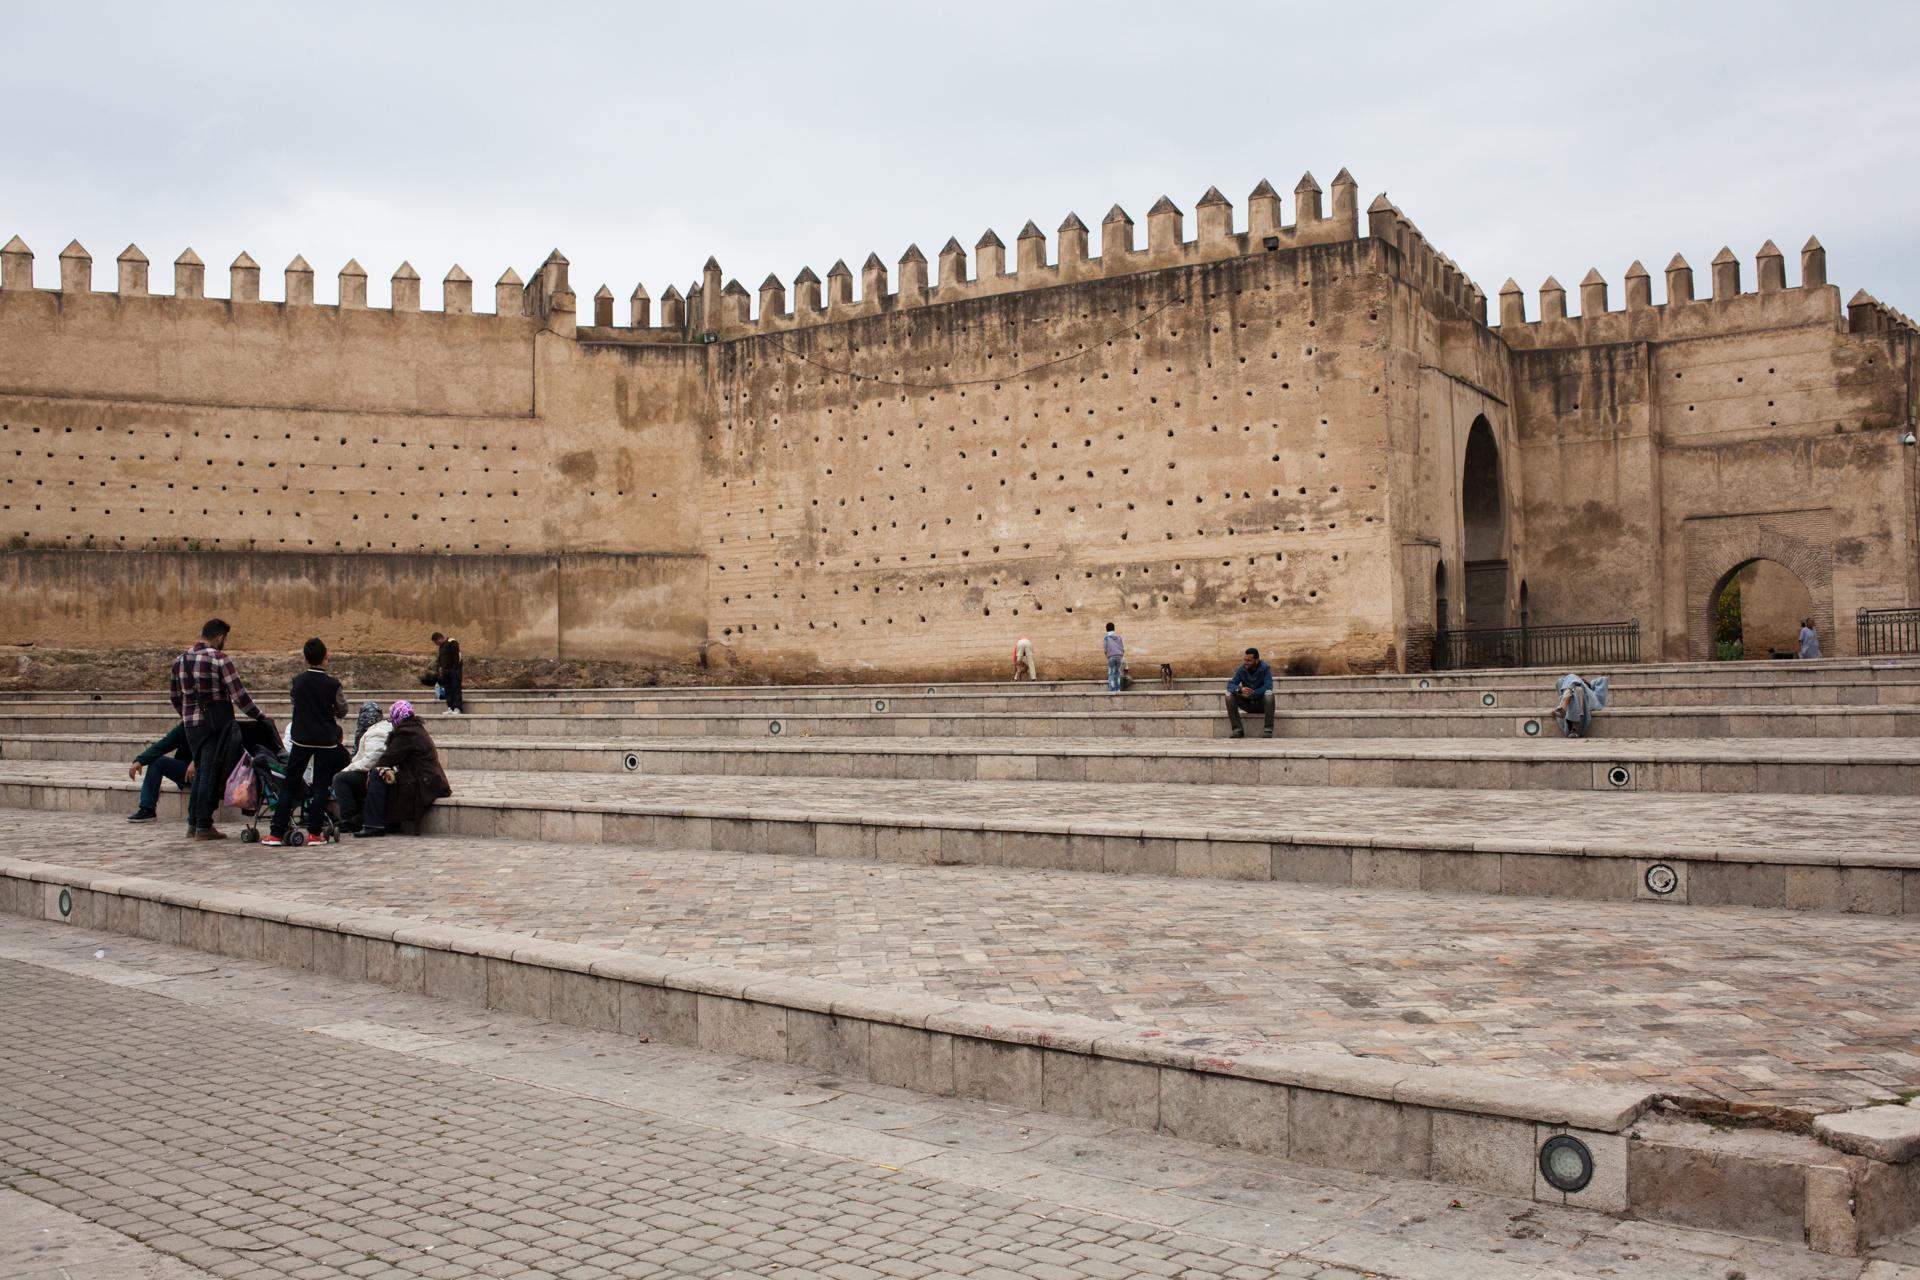 Getting outside the medina